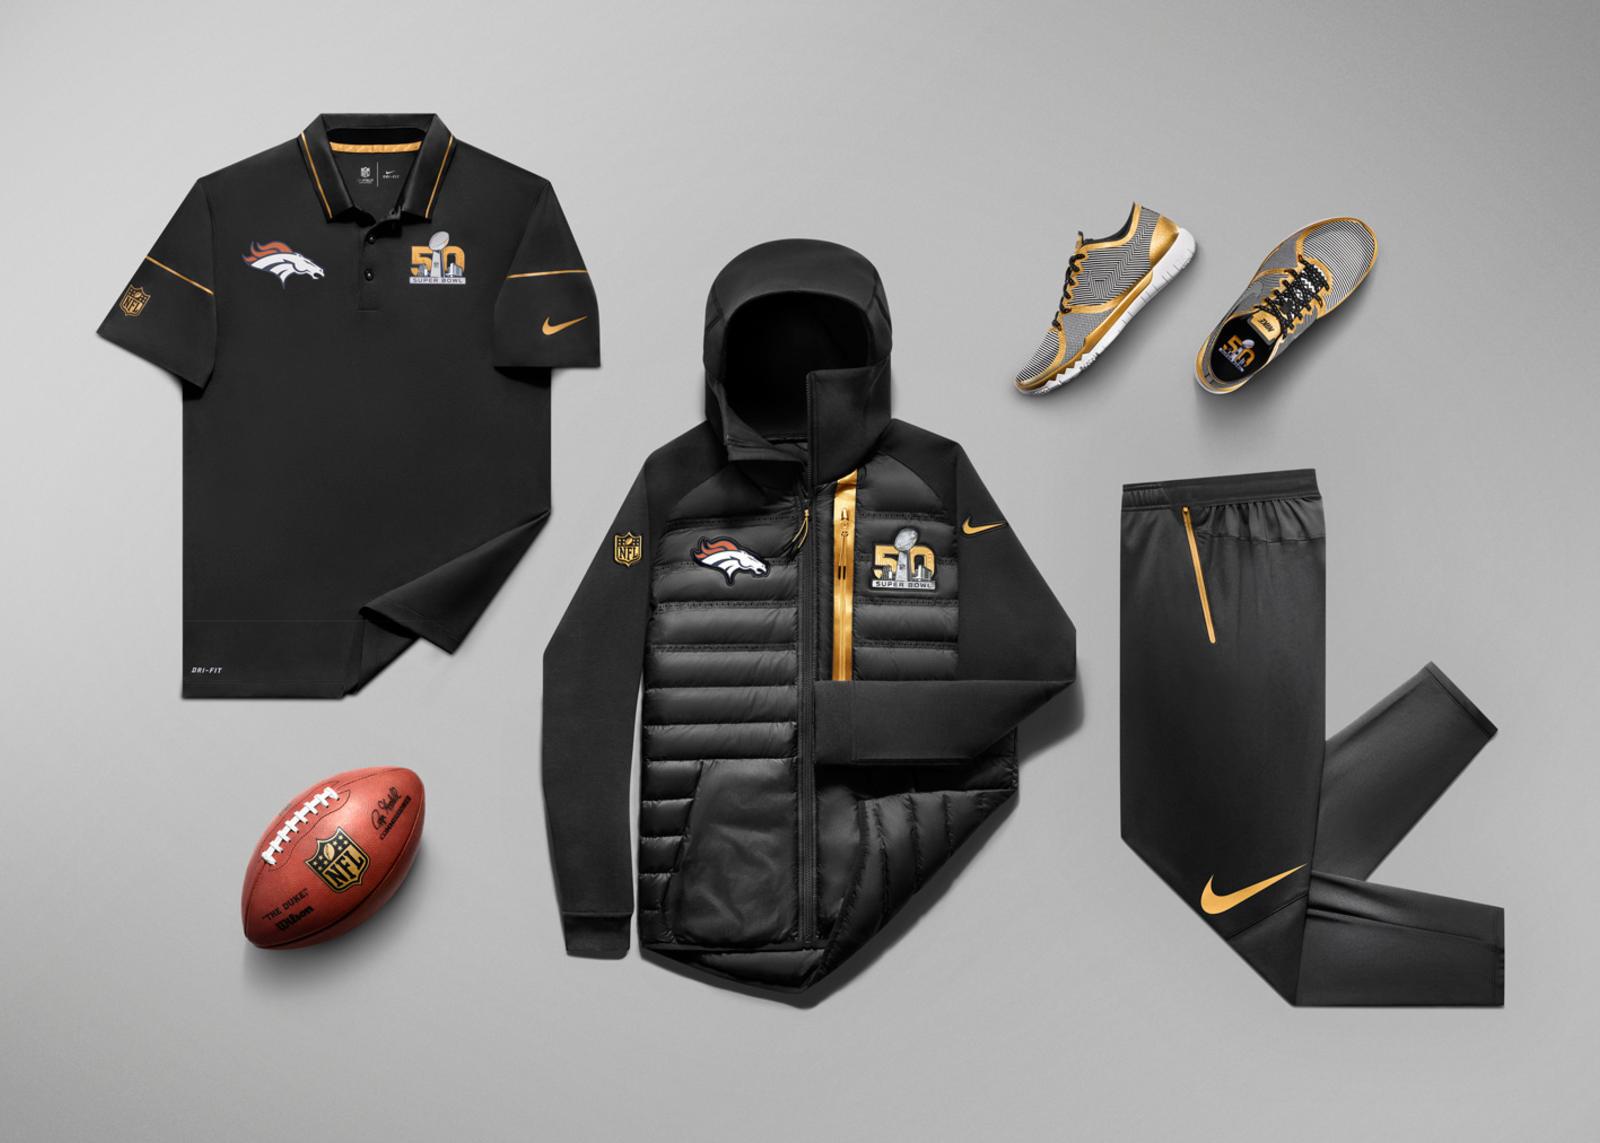 "reputable site a4fa9 5d45d A pocas semanas del tan anticipado evento deportivo, hemos podido echarle  un vistazo a la especial colección ""Super Bowl 50 Nike Gold Collection"" que  ha ..."